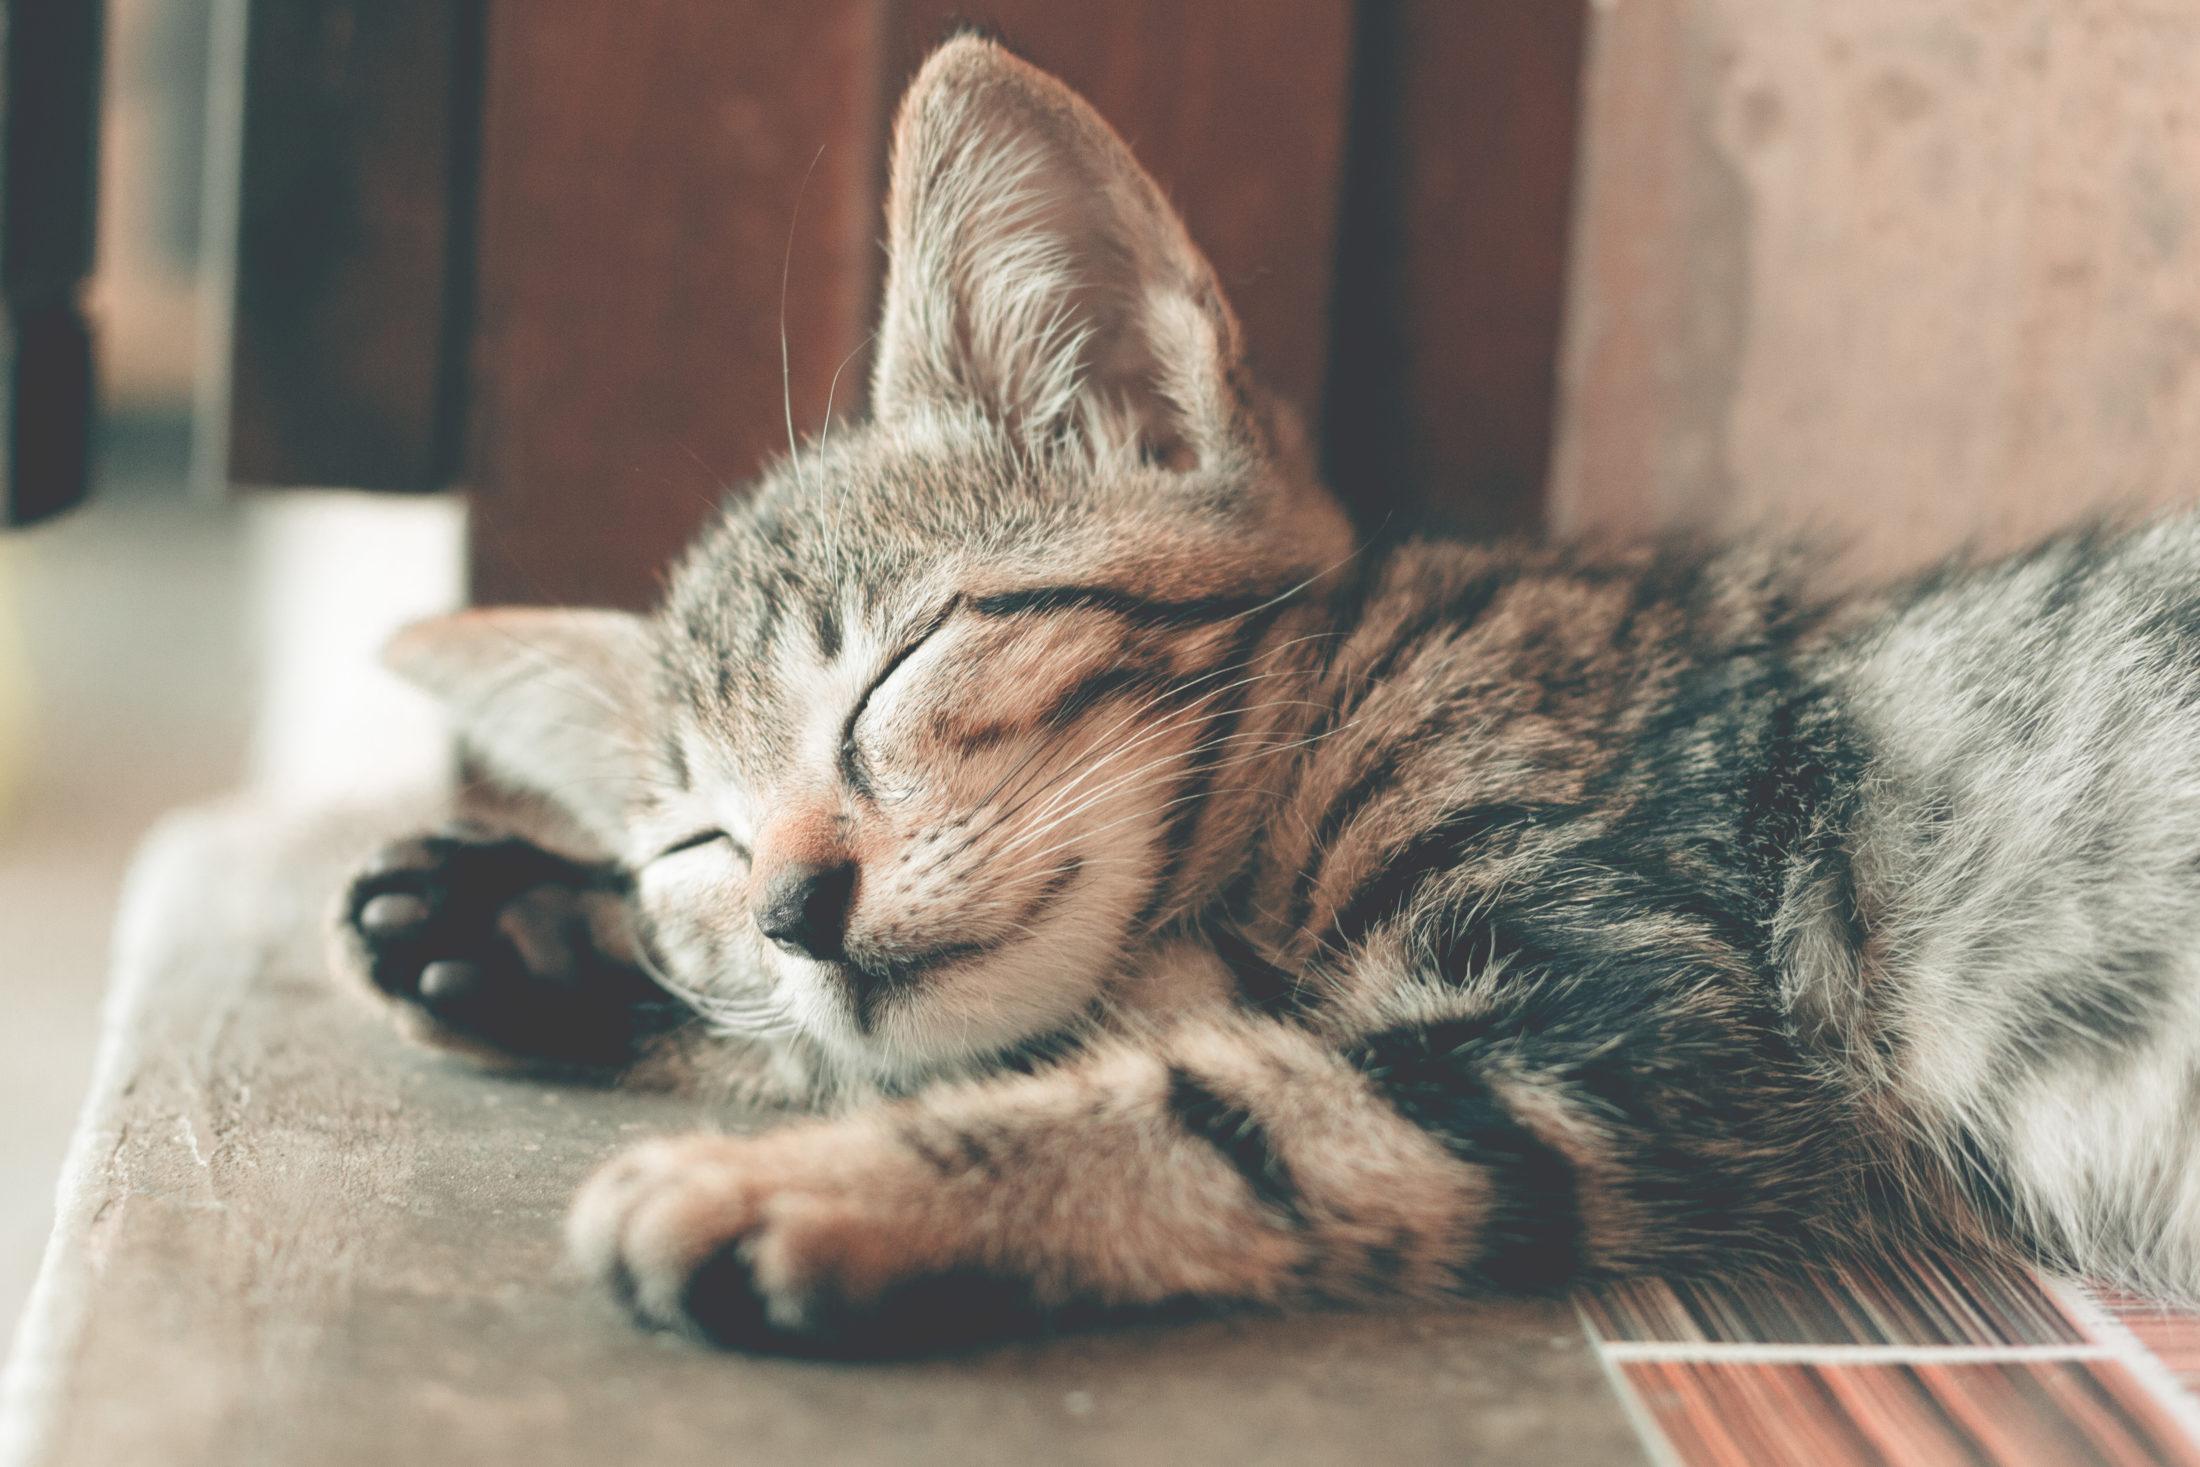 gato tigrado deitado no chão de olhso fechados